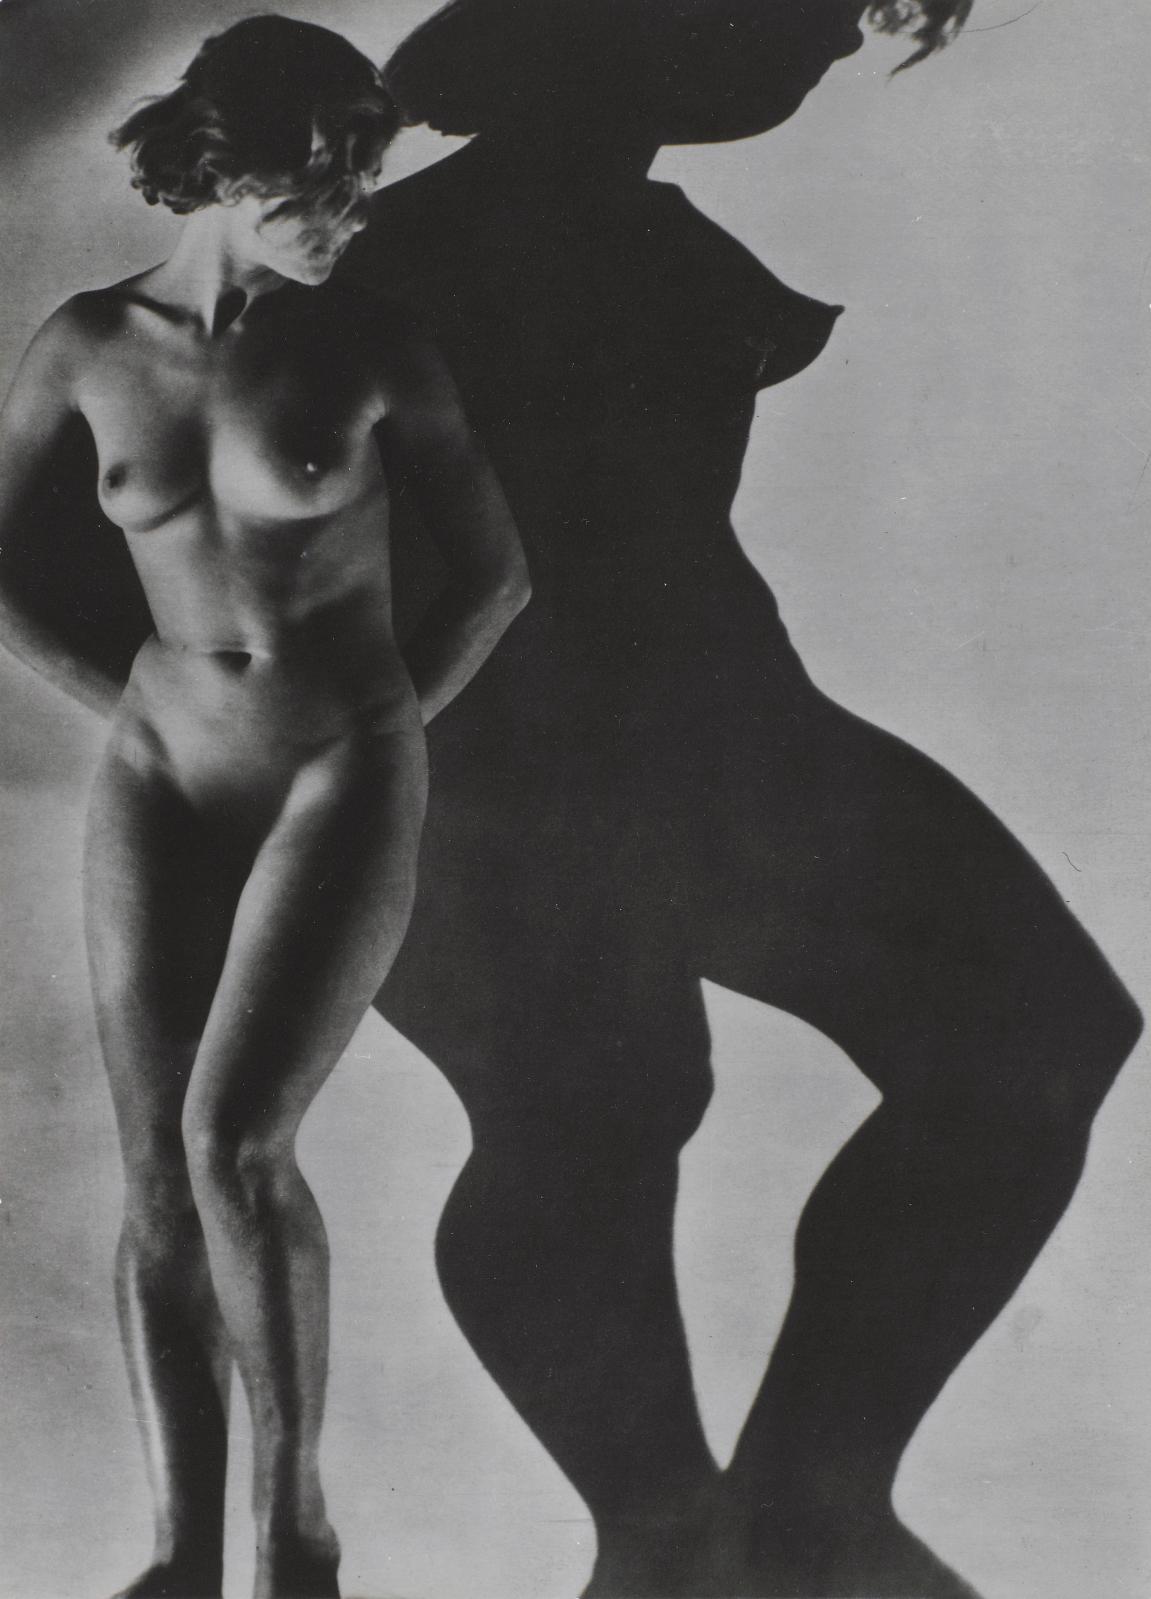 Assia, 1934, gelatine silver print, 26.4 x 19.5 cm.